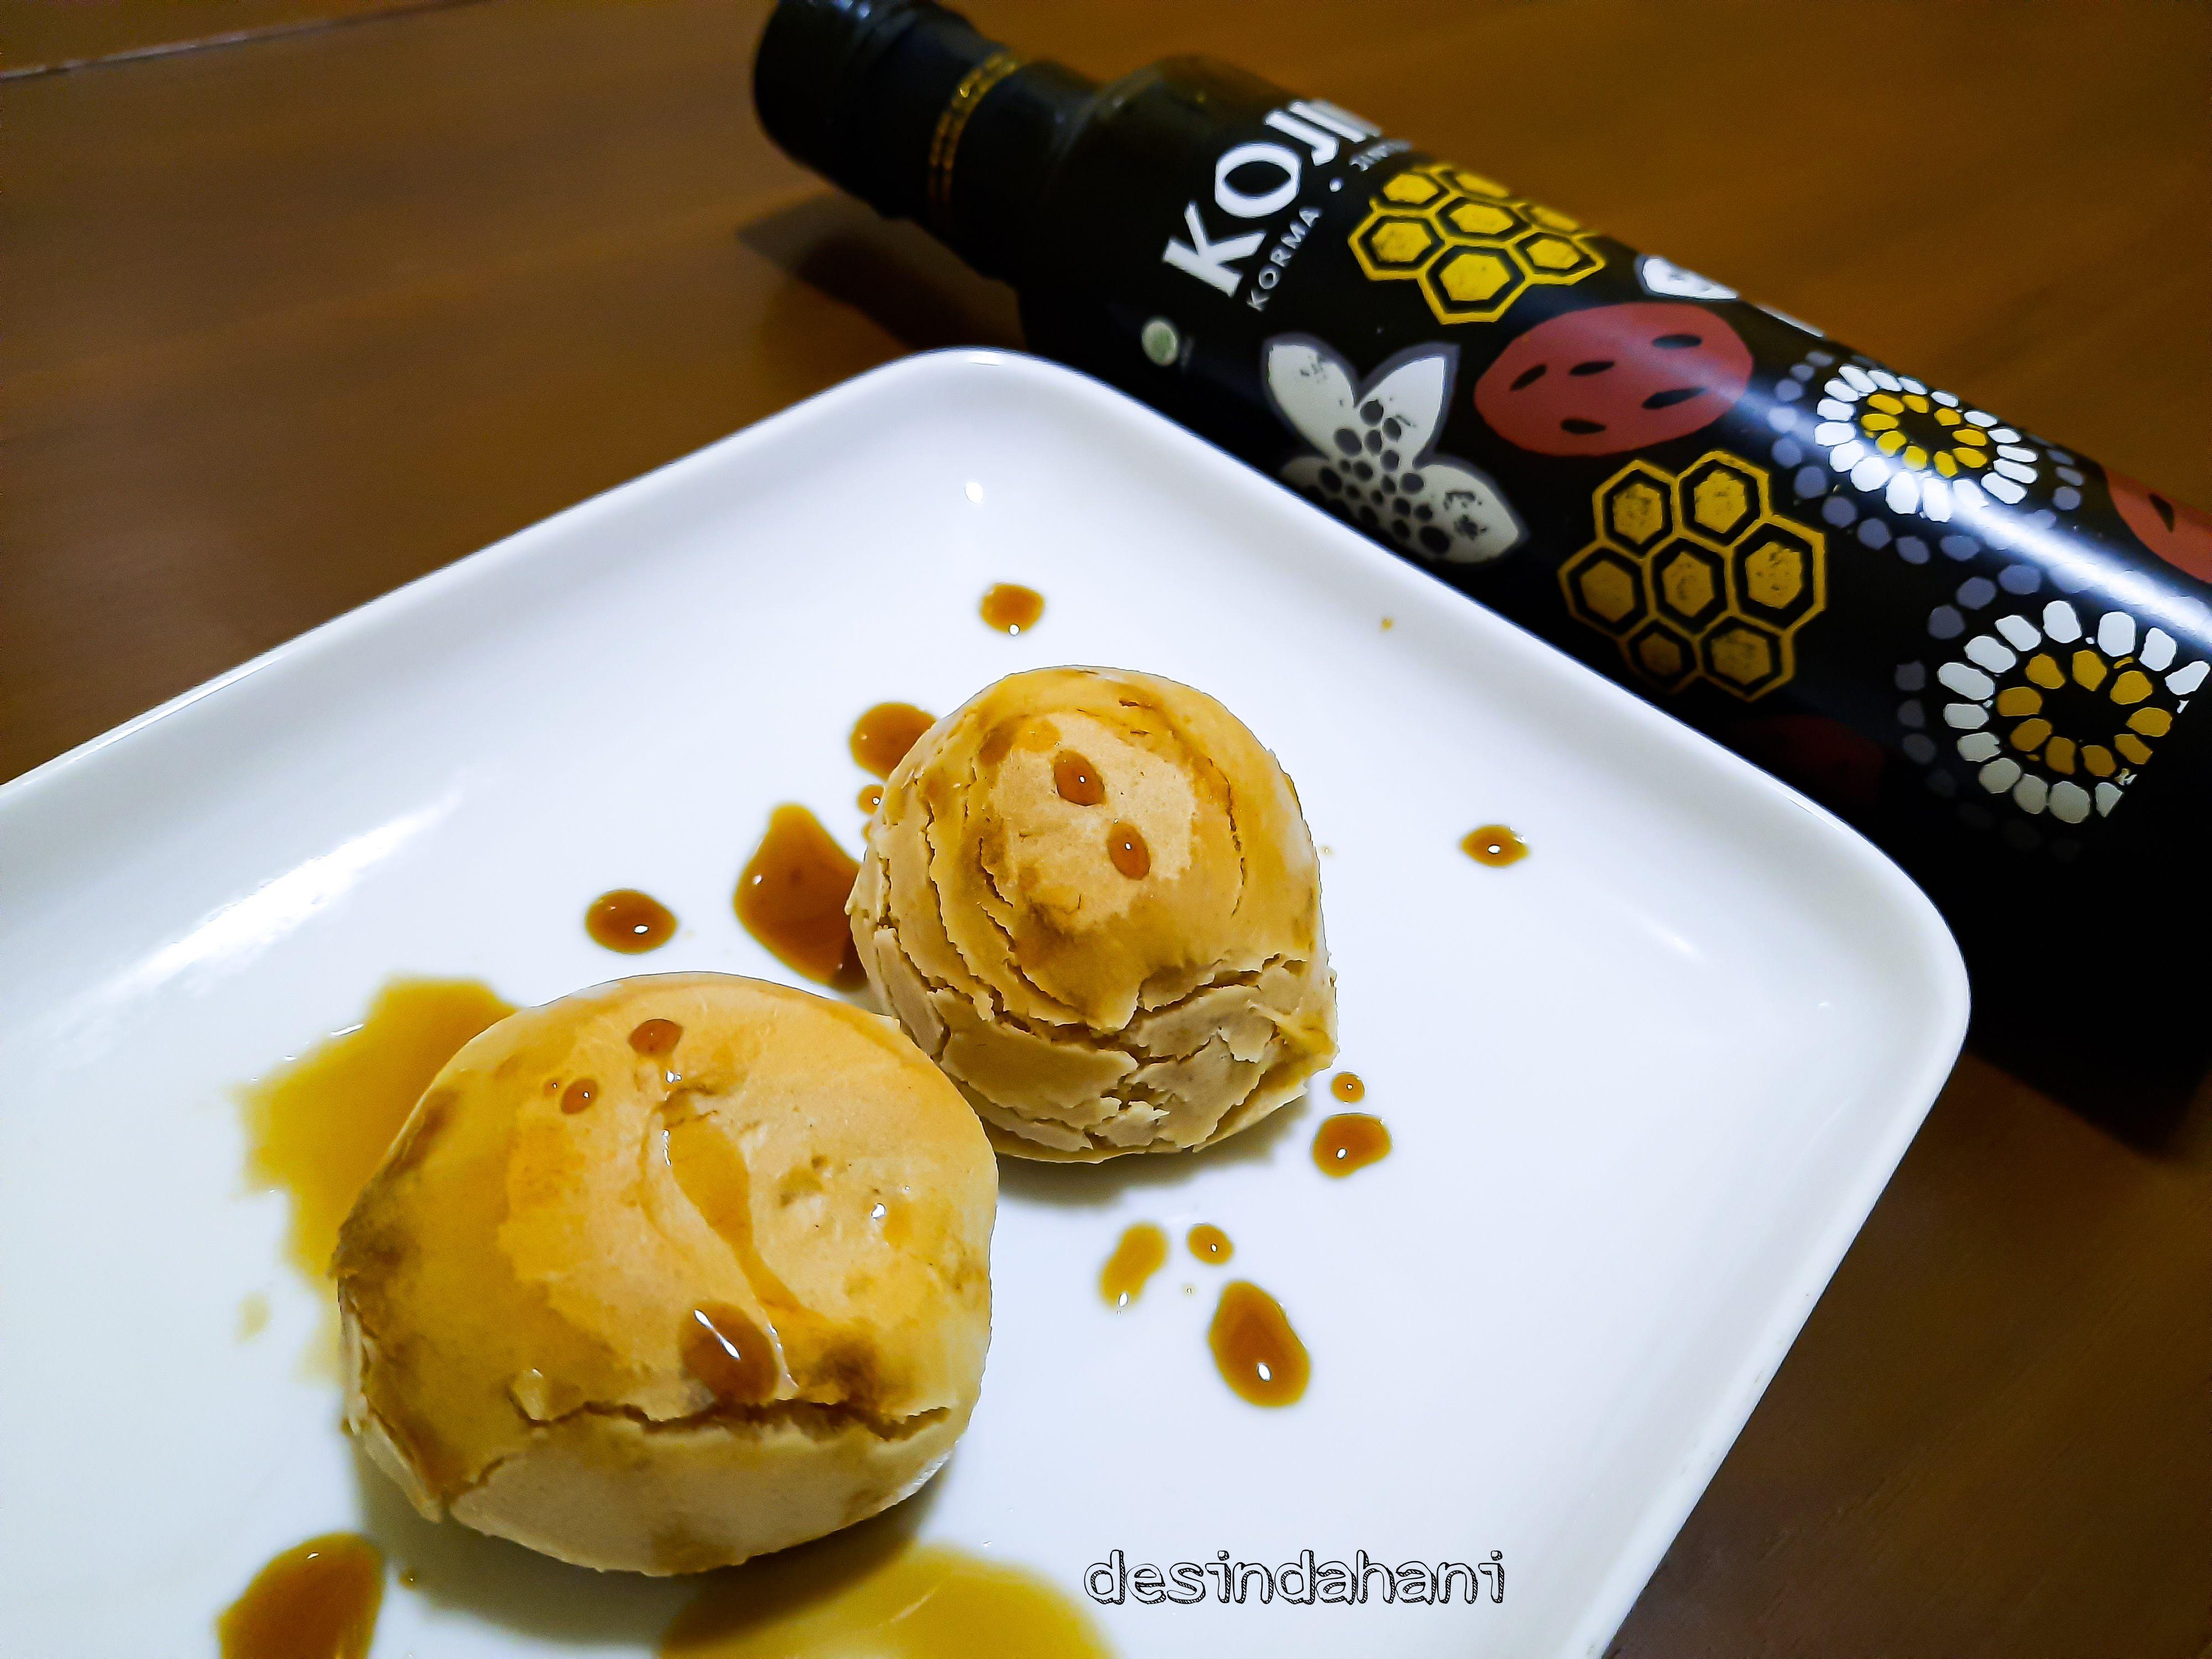 Ilustrasi Roti Koing dan Kojima (sumber: dokumentasi pribadi)